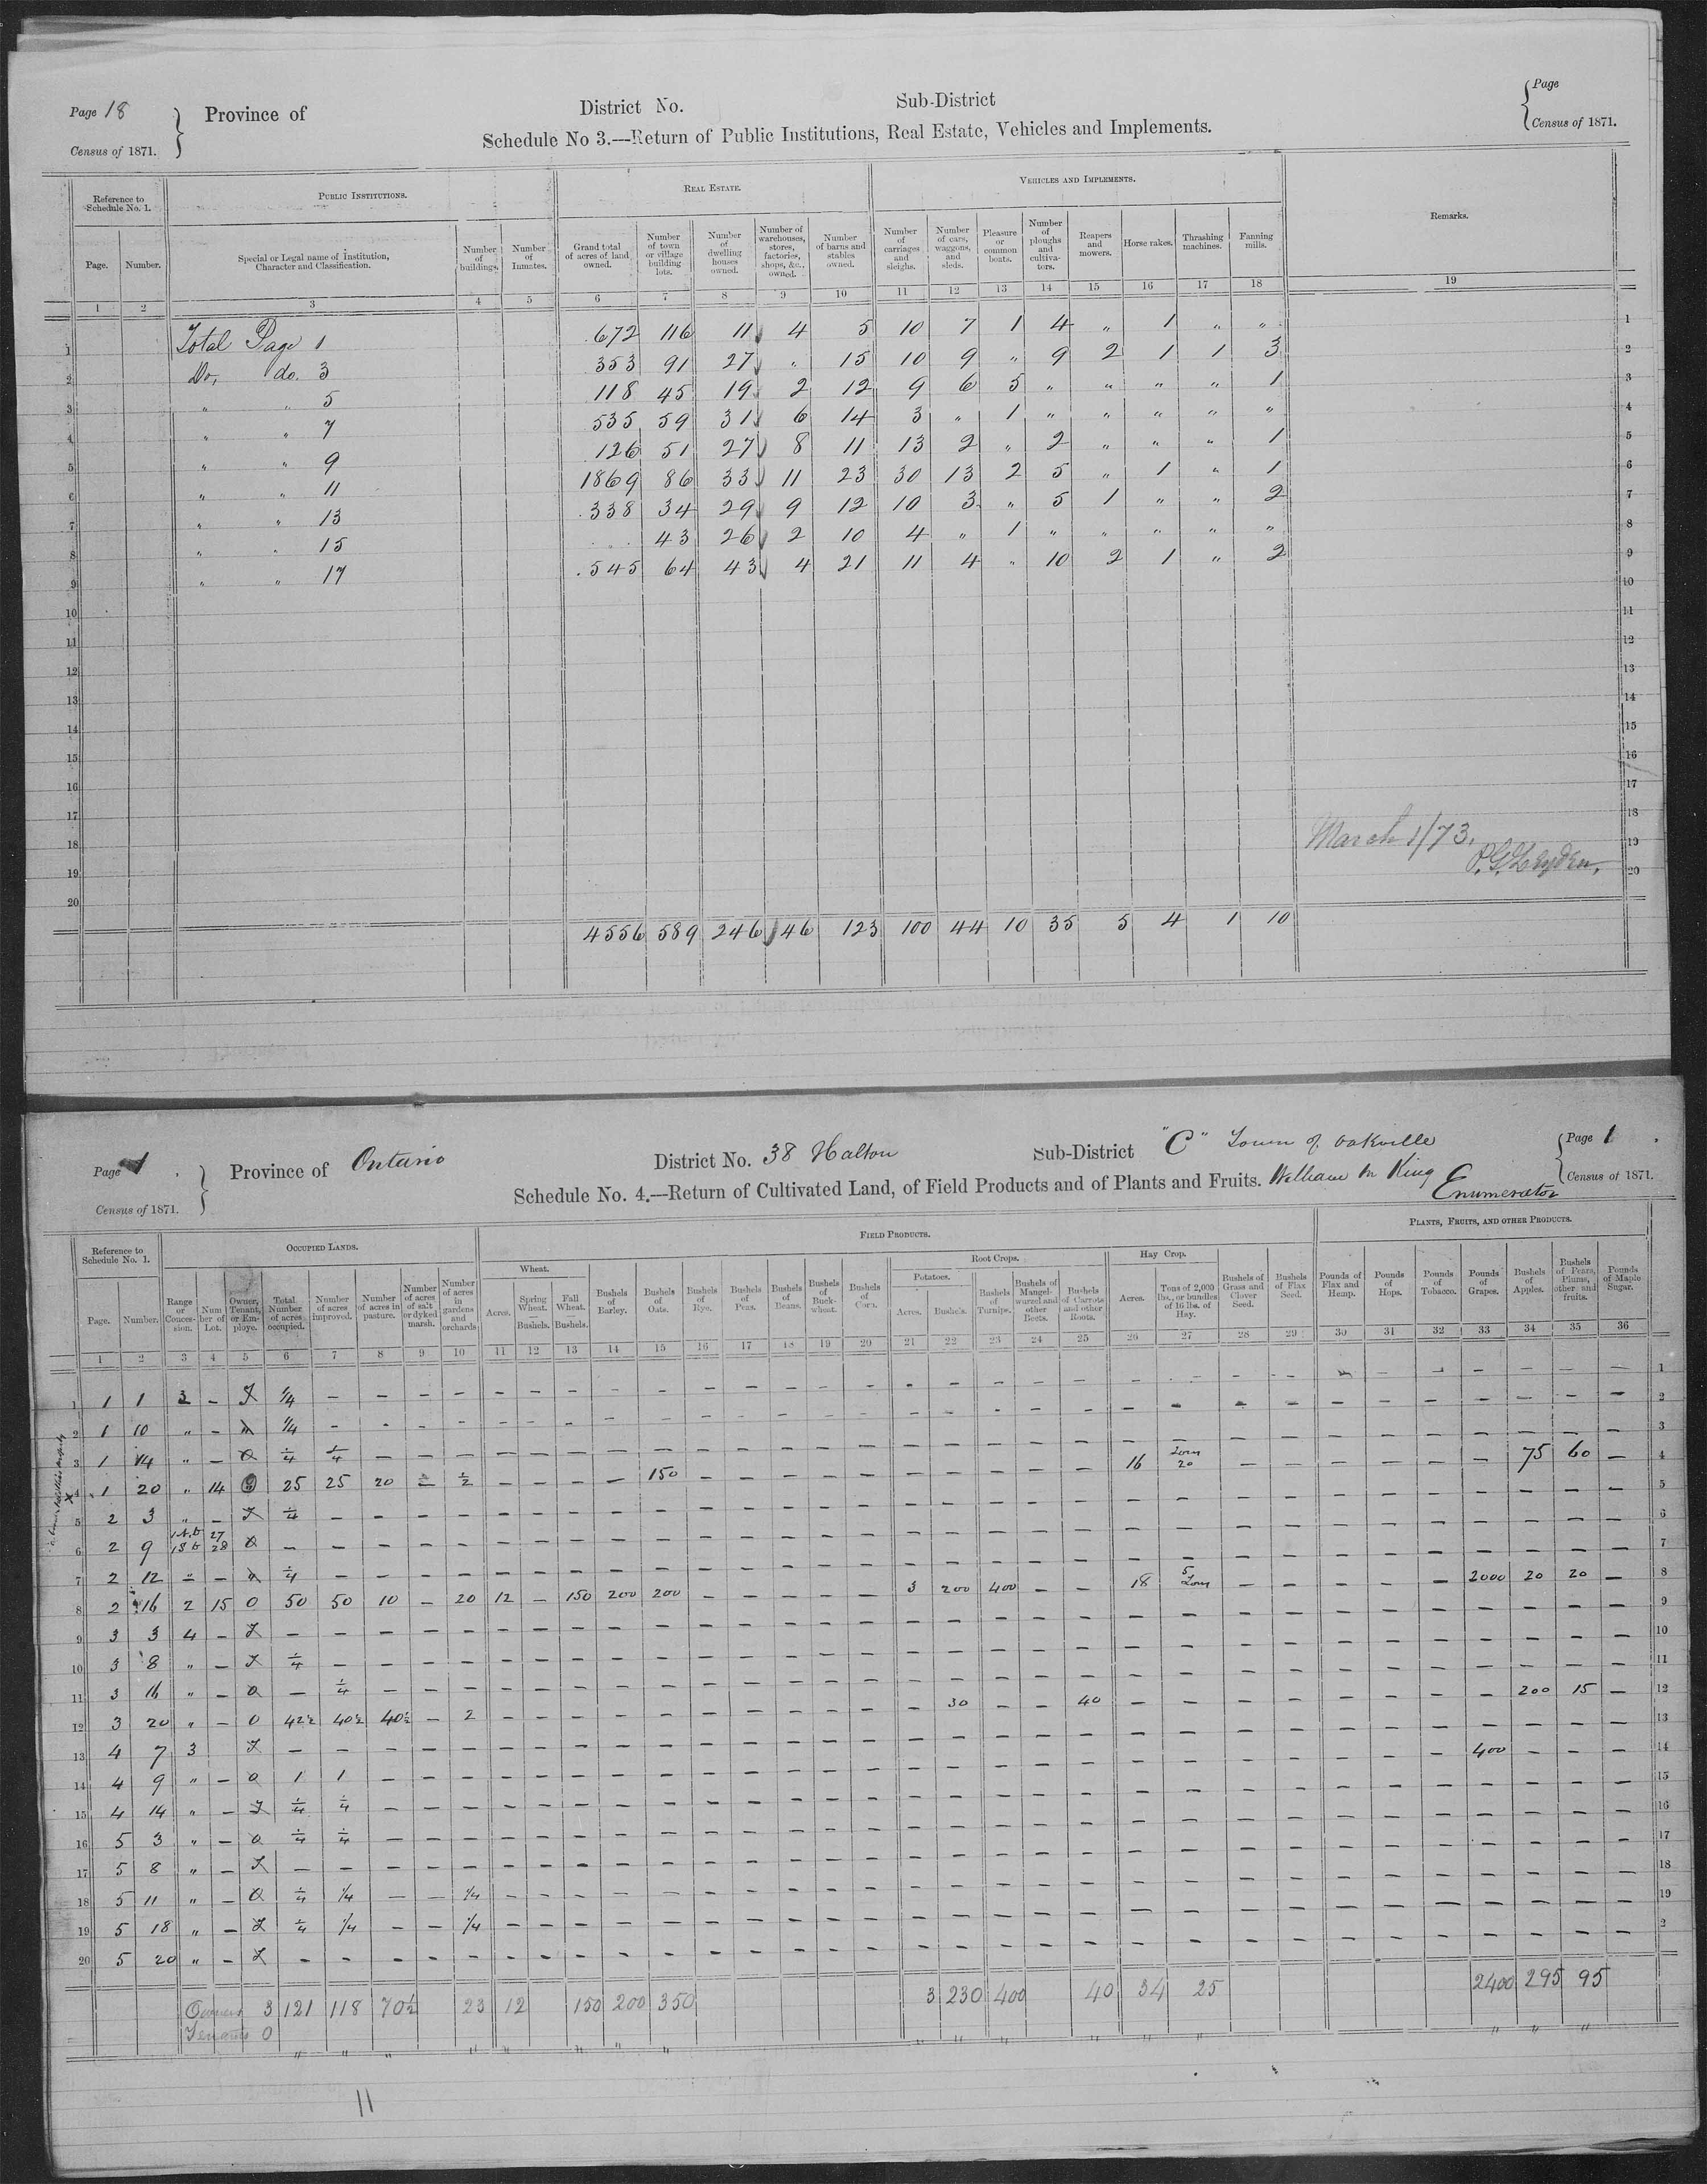 Titre: Recensement du Canada (1871) - N° d'enregistrement Mikan: 194056 - Microforme: c-9956